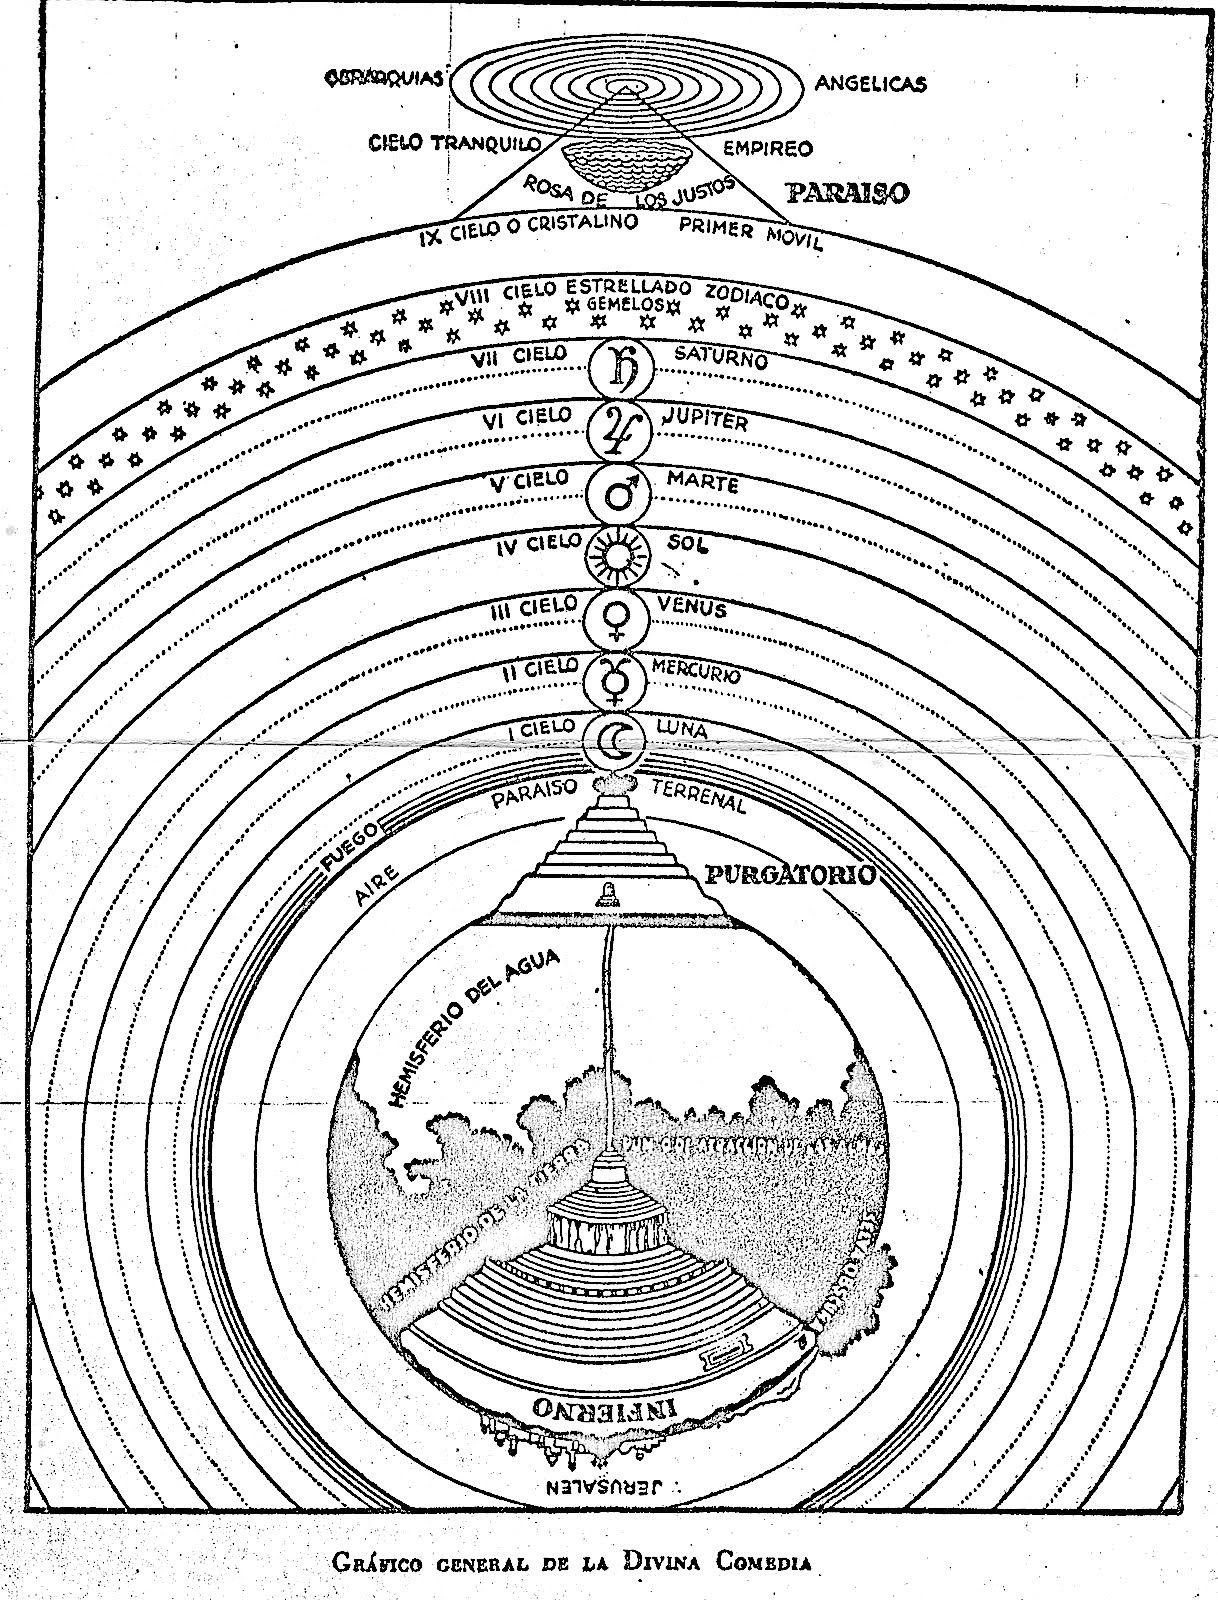 Grafico General De La Divina Comedia